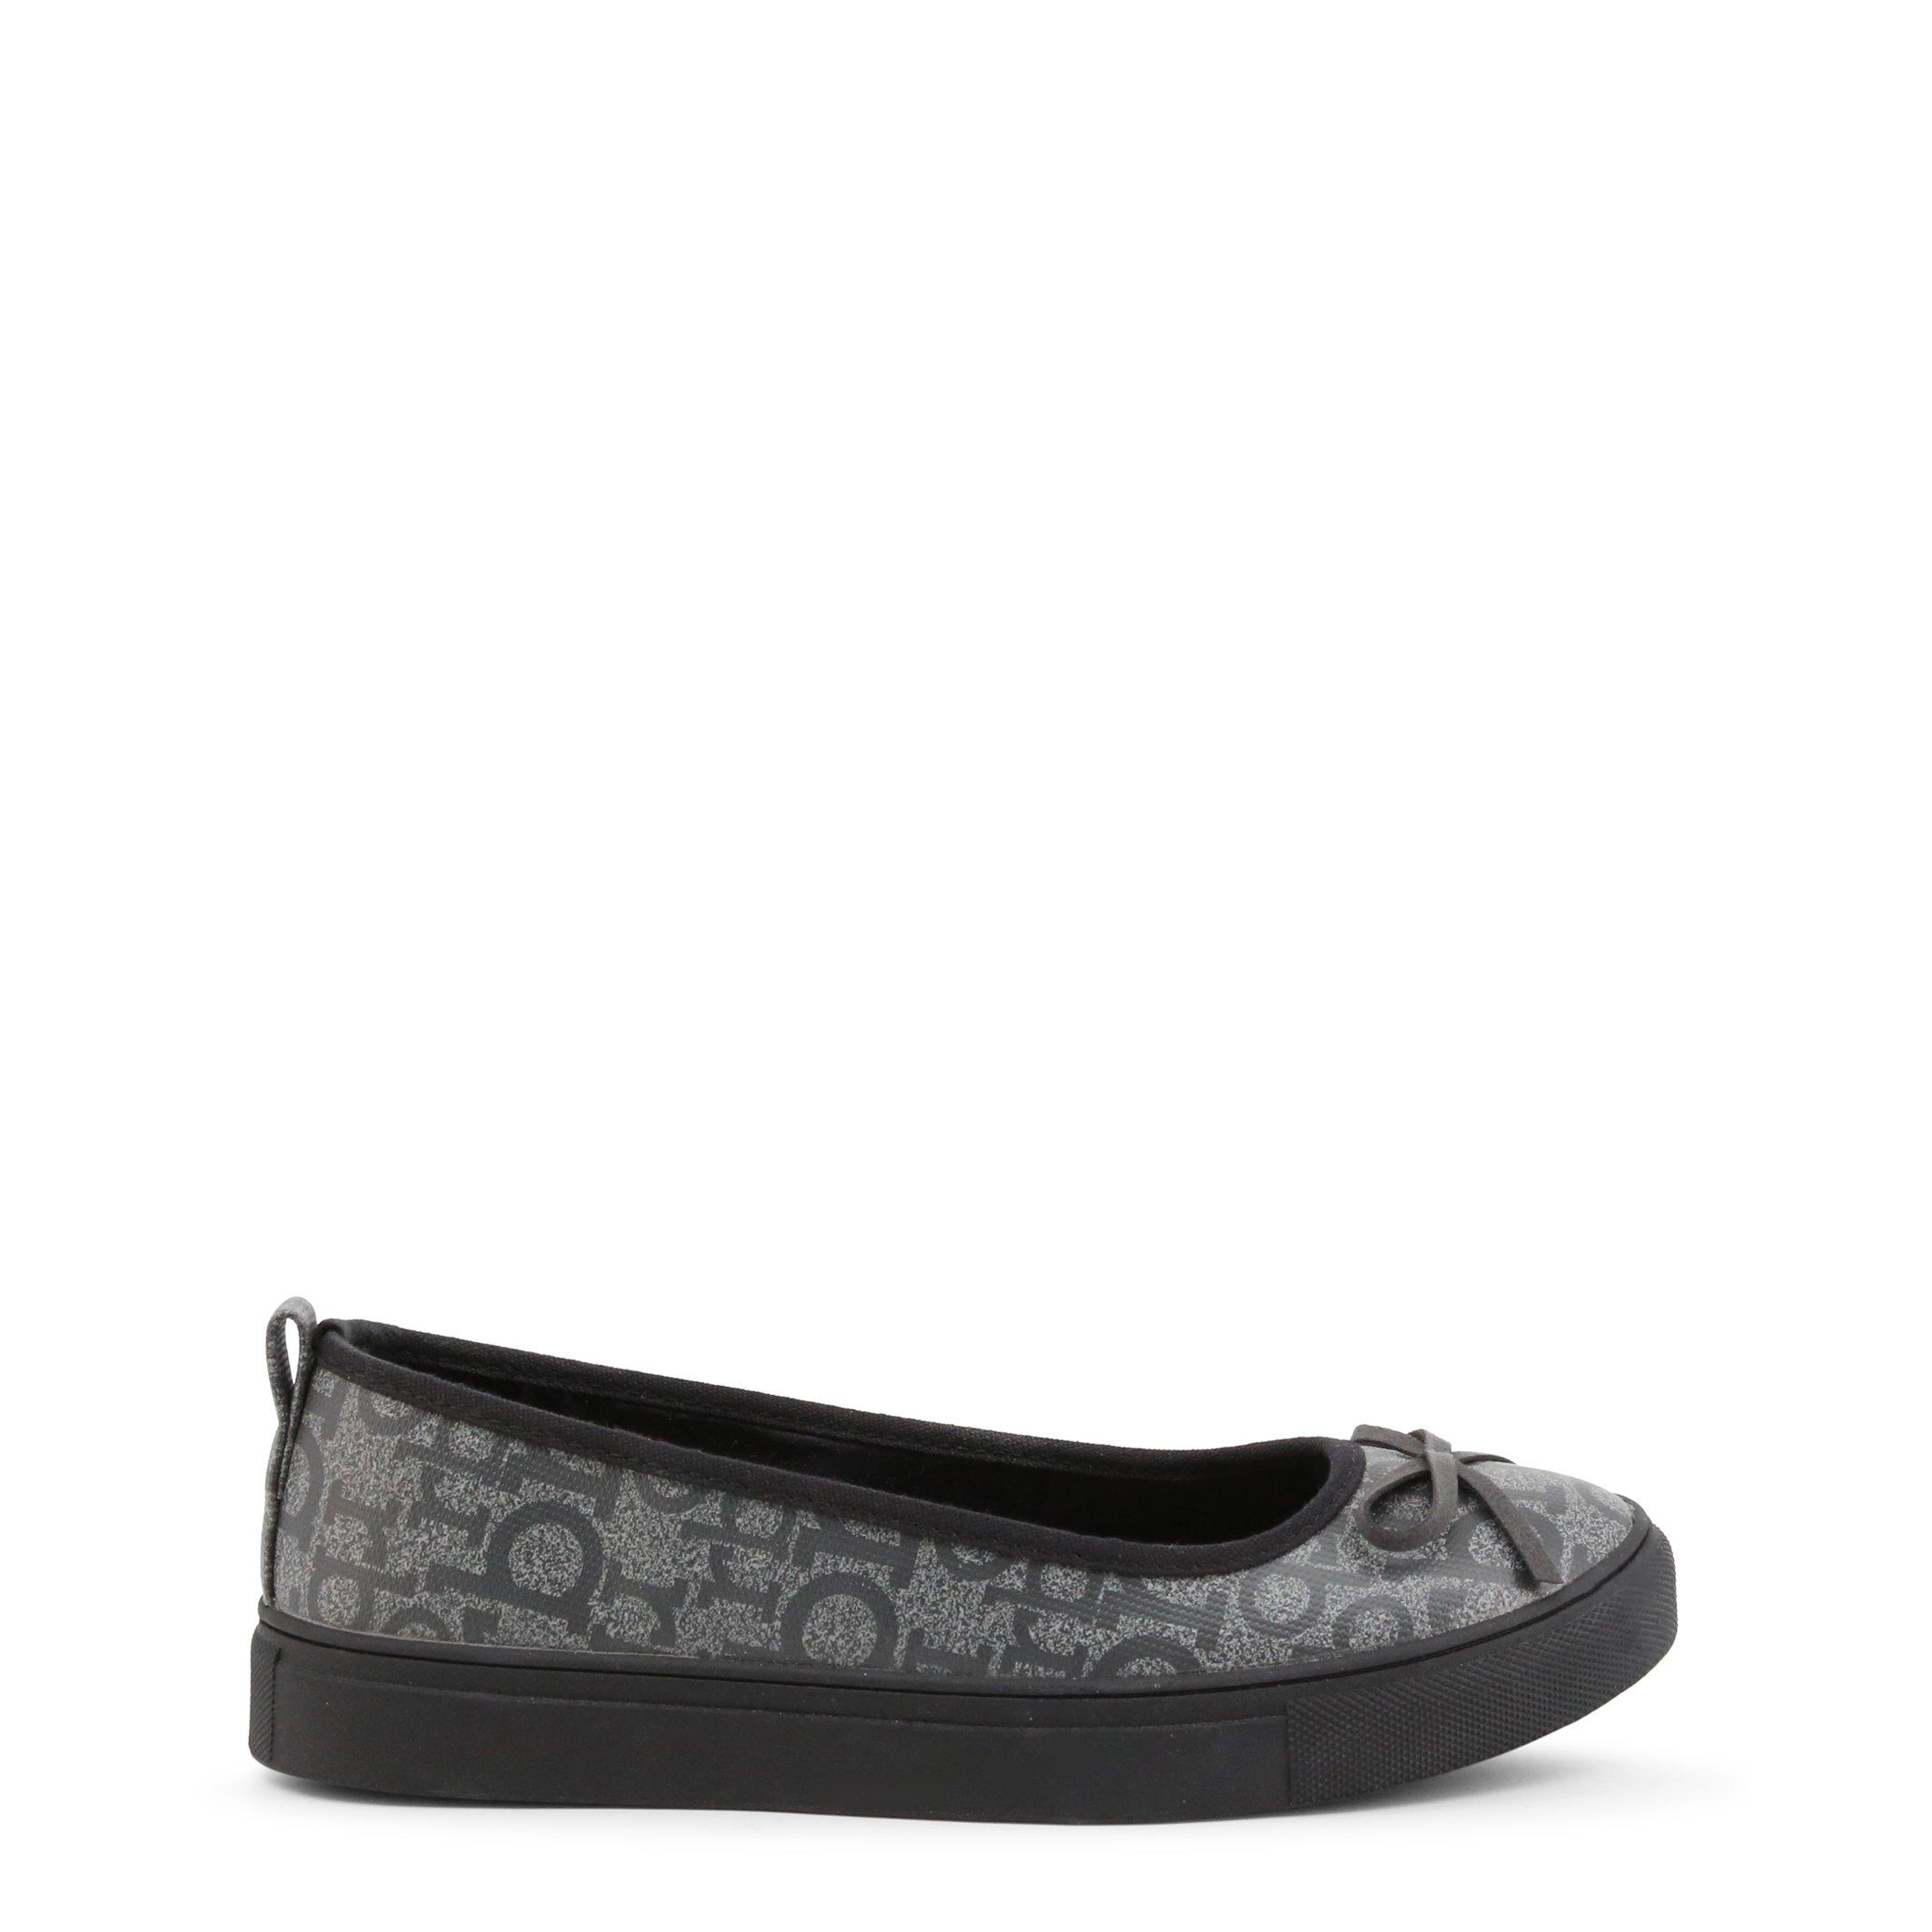 Roccobarocco Women's Flat Shoe Brown RBSC0VB01 - grey EU 36